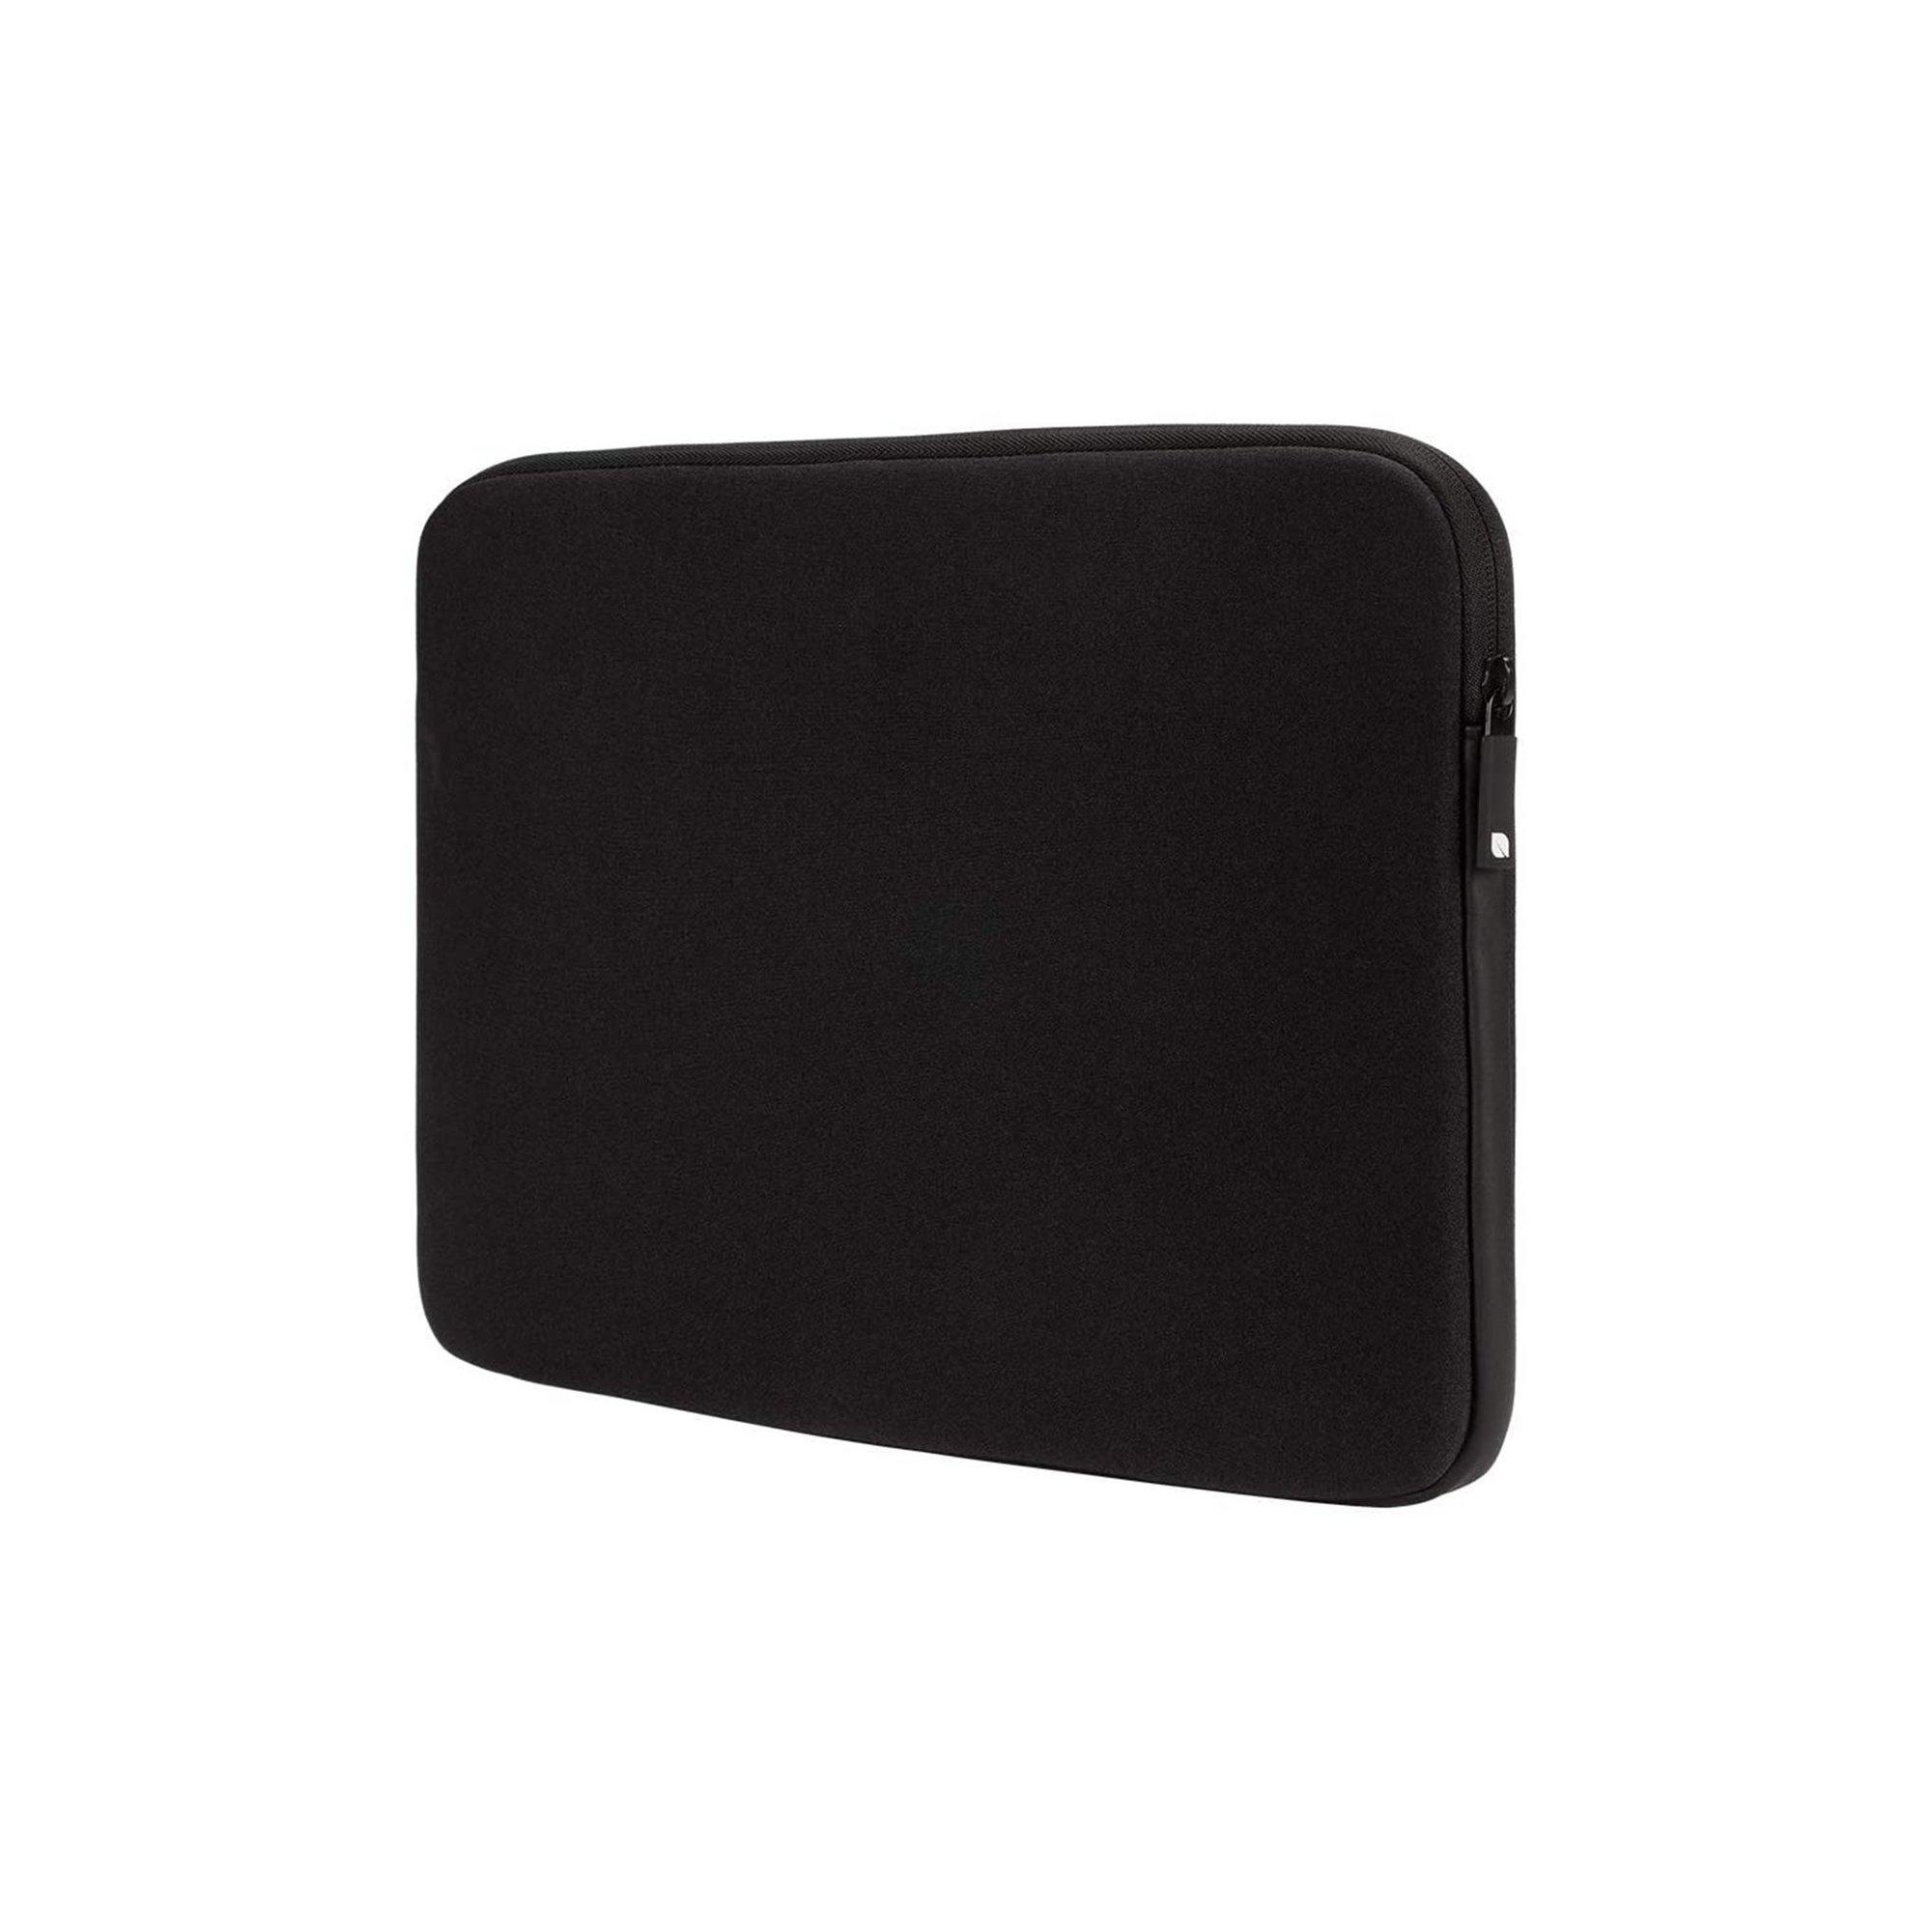 Image of Incase Classic 16 Inch Black Laptop Sleeve